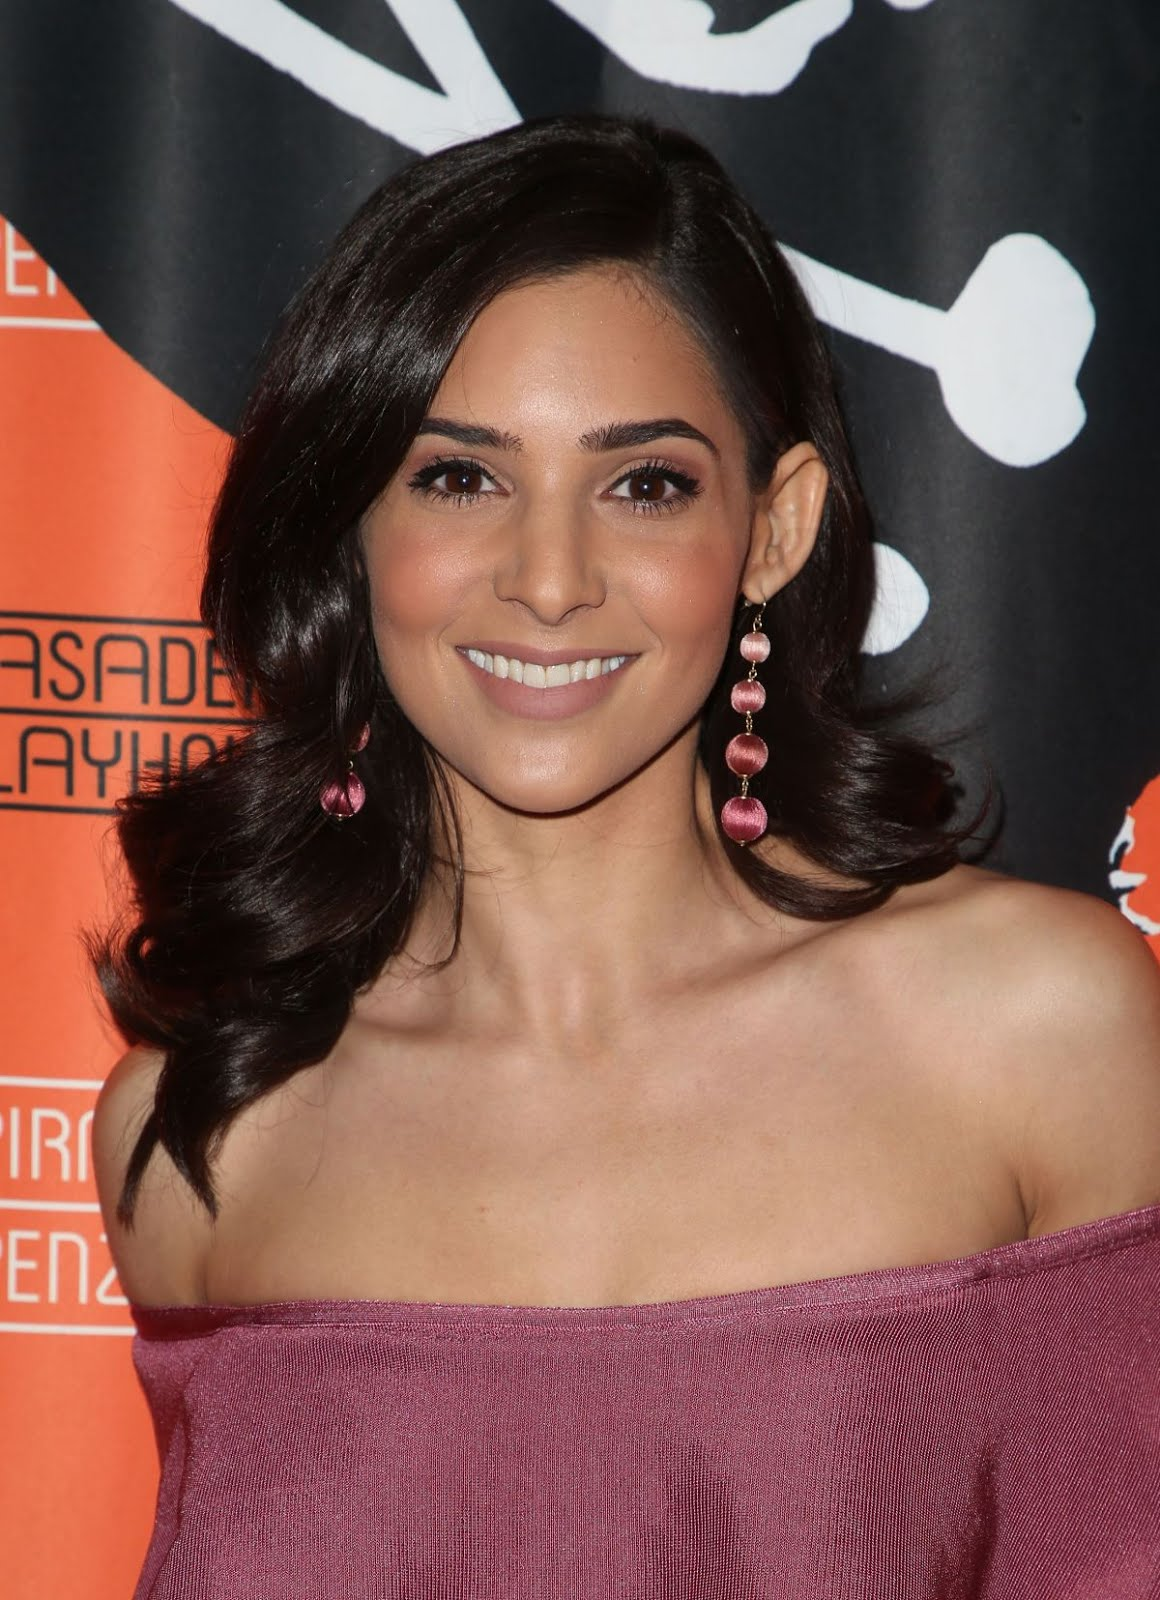 Camila Banus At Pirates Of Penzance Opening Night In Los Angeles